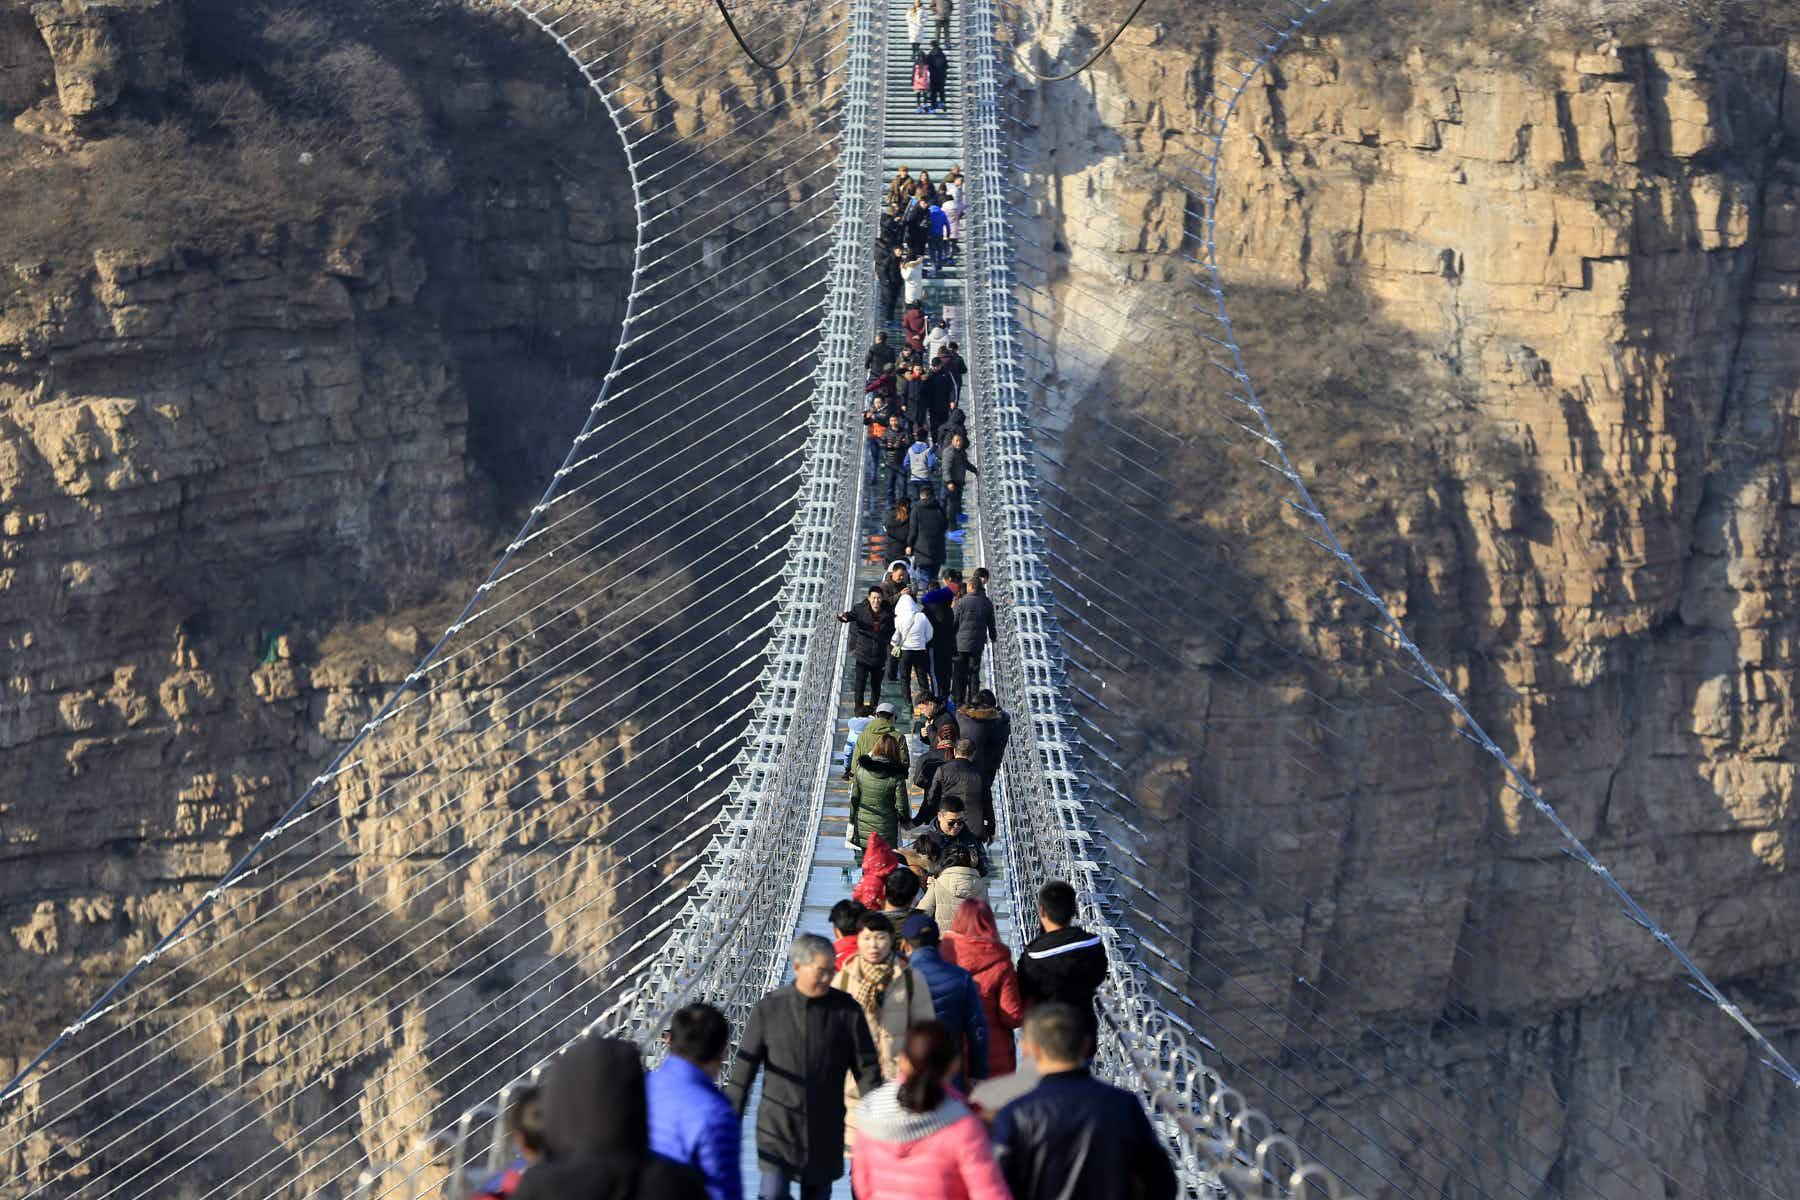 Defy gravity on China's new record-breaking glass bridge